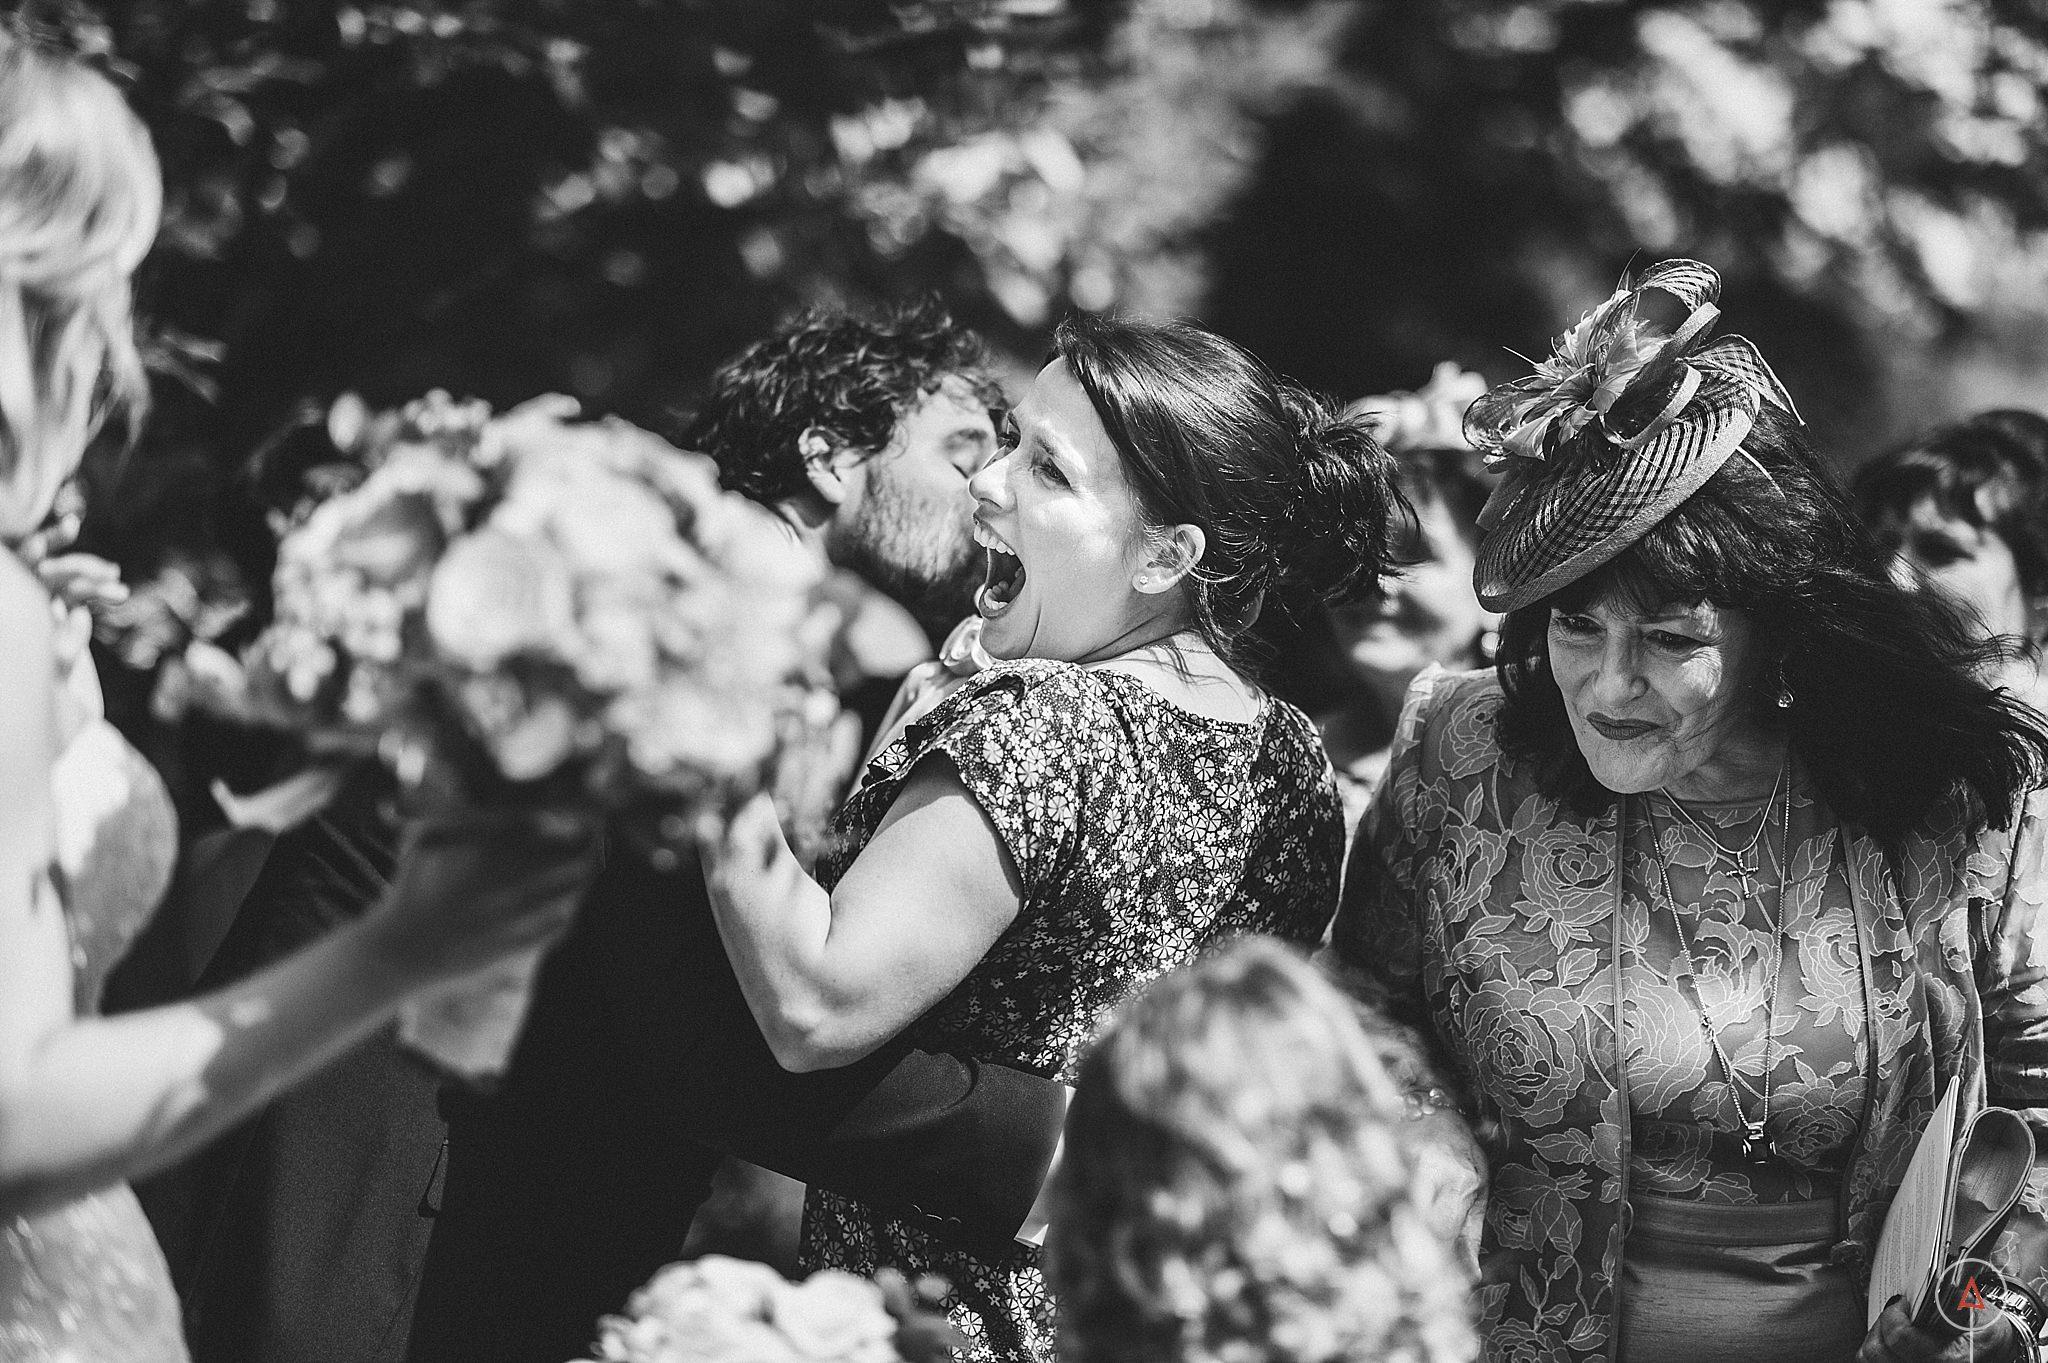 cardiff-wedding-photographer-aga-tomaszek_0369